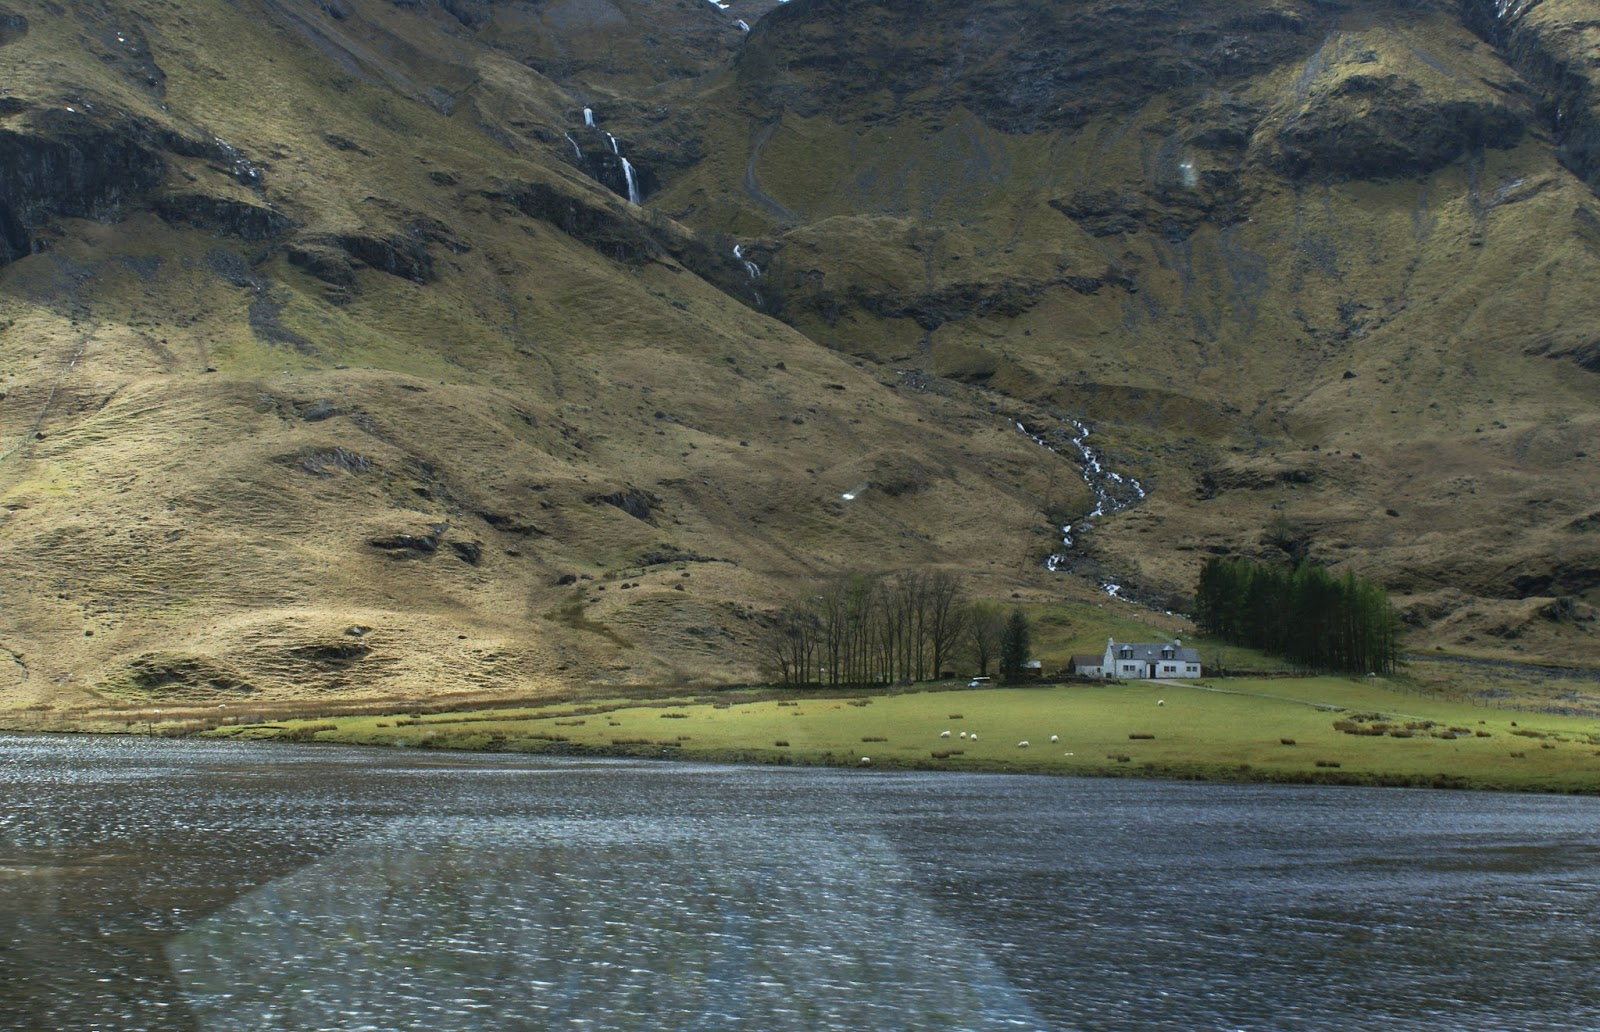 glen coe highlands scotland united kingdom uk roadtrip